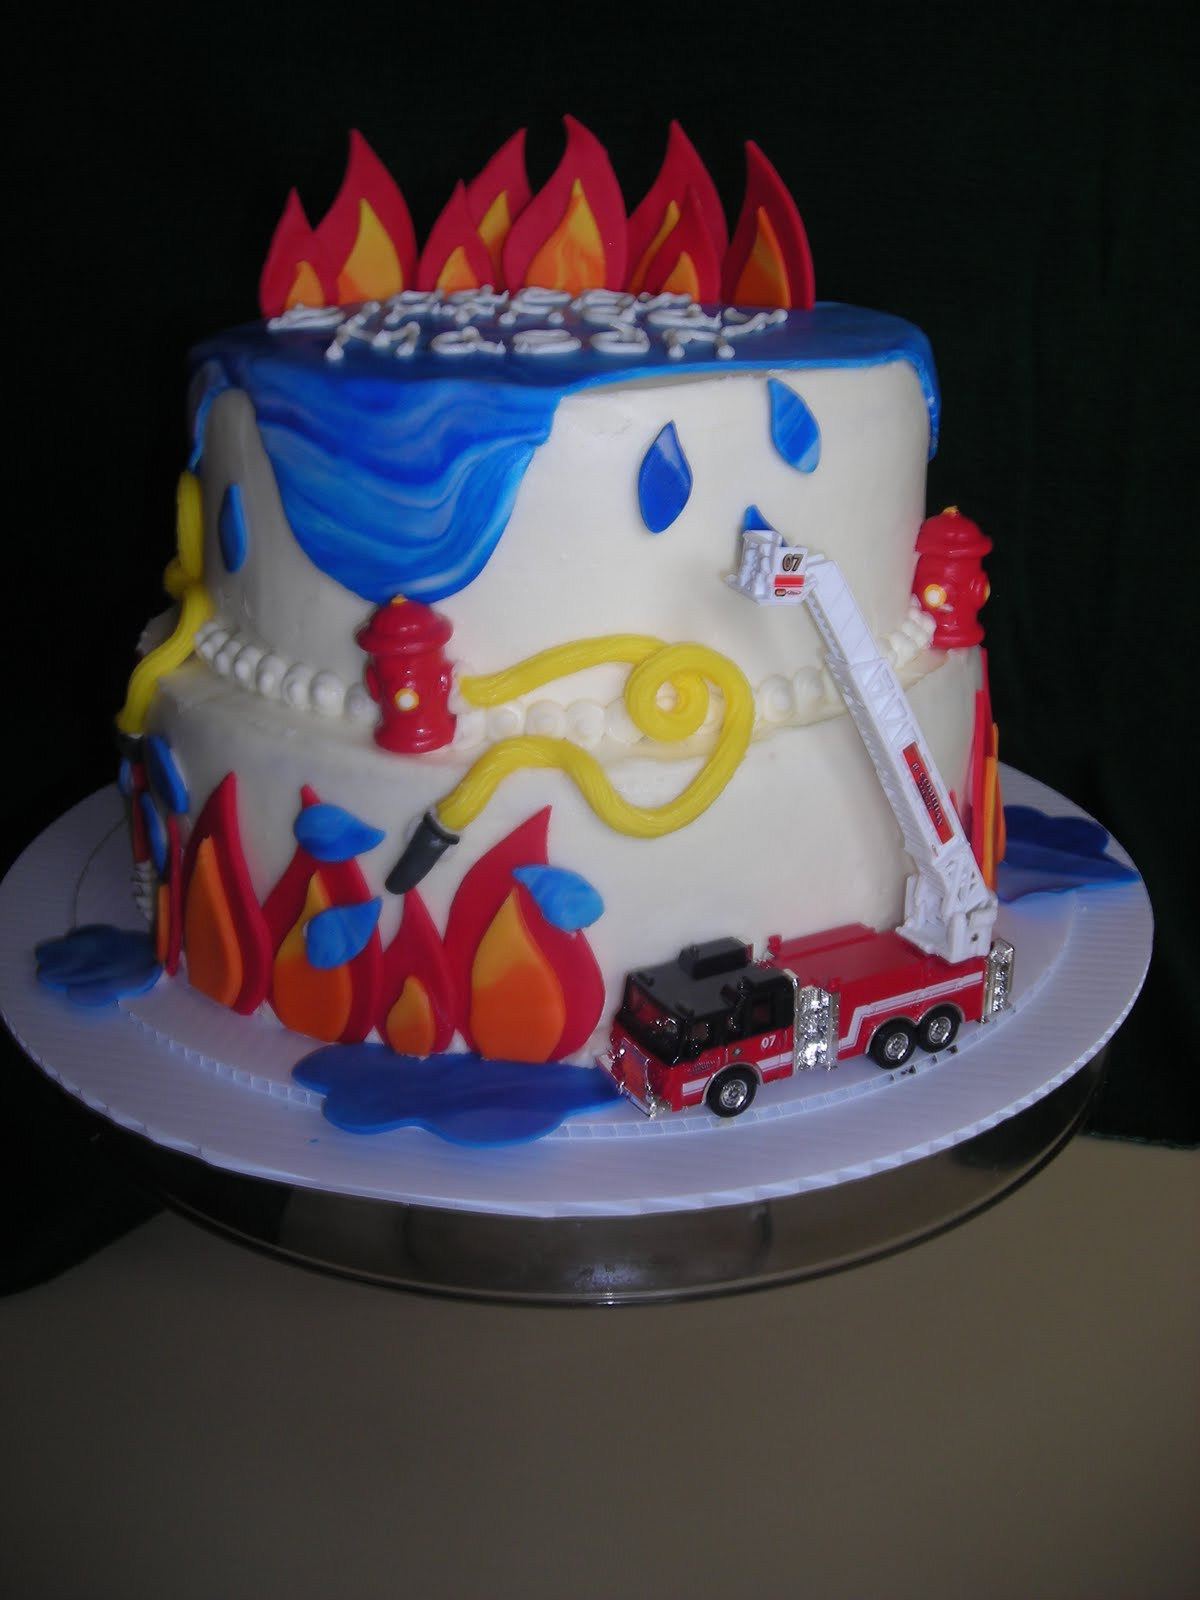 Pattycakes Fireman Theme Birthday Cake